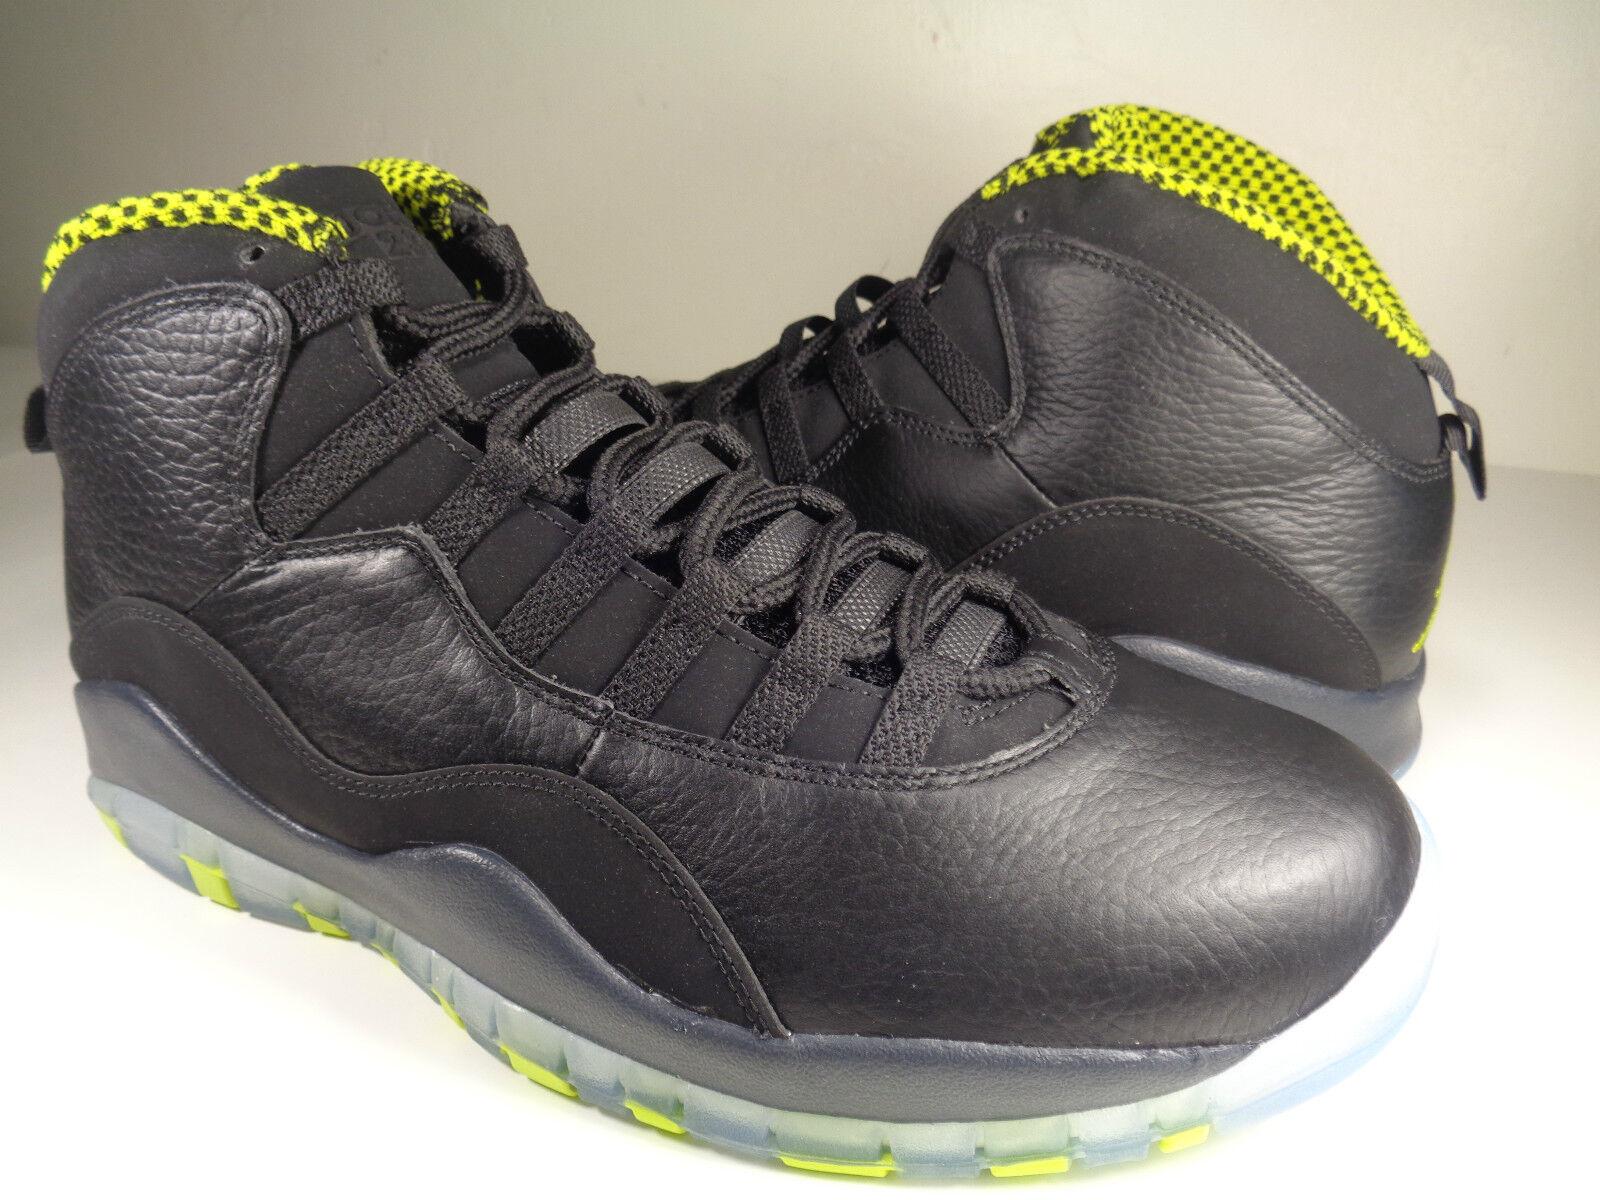 Nike Air Jordan Retro 10 X Venom Green Cool Grey Anthracite SZ 10 (310805-033)